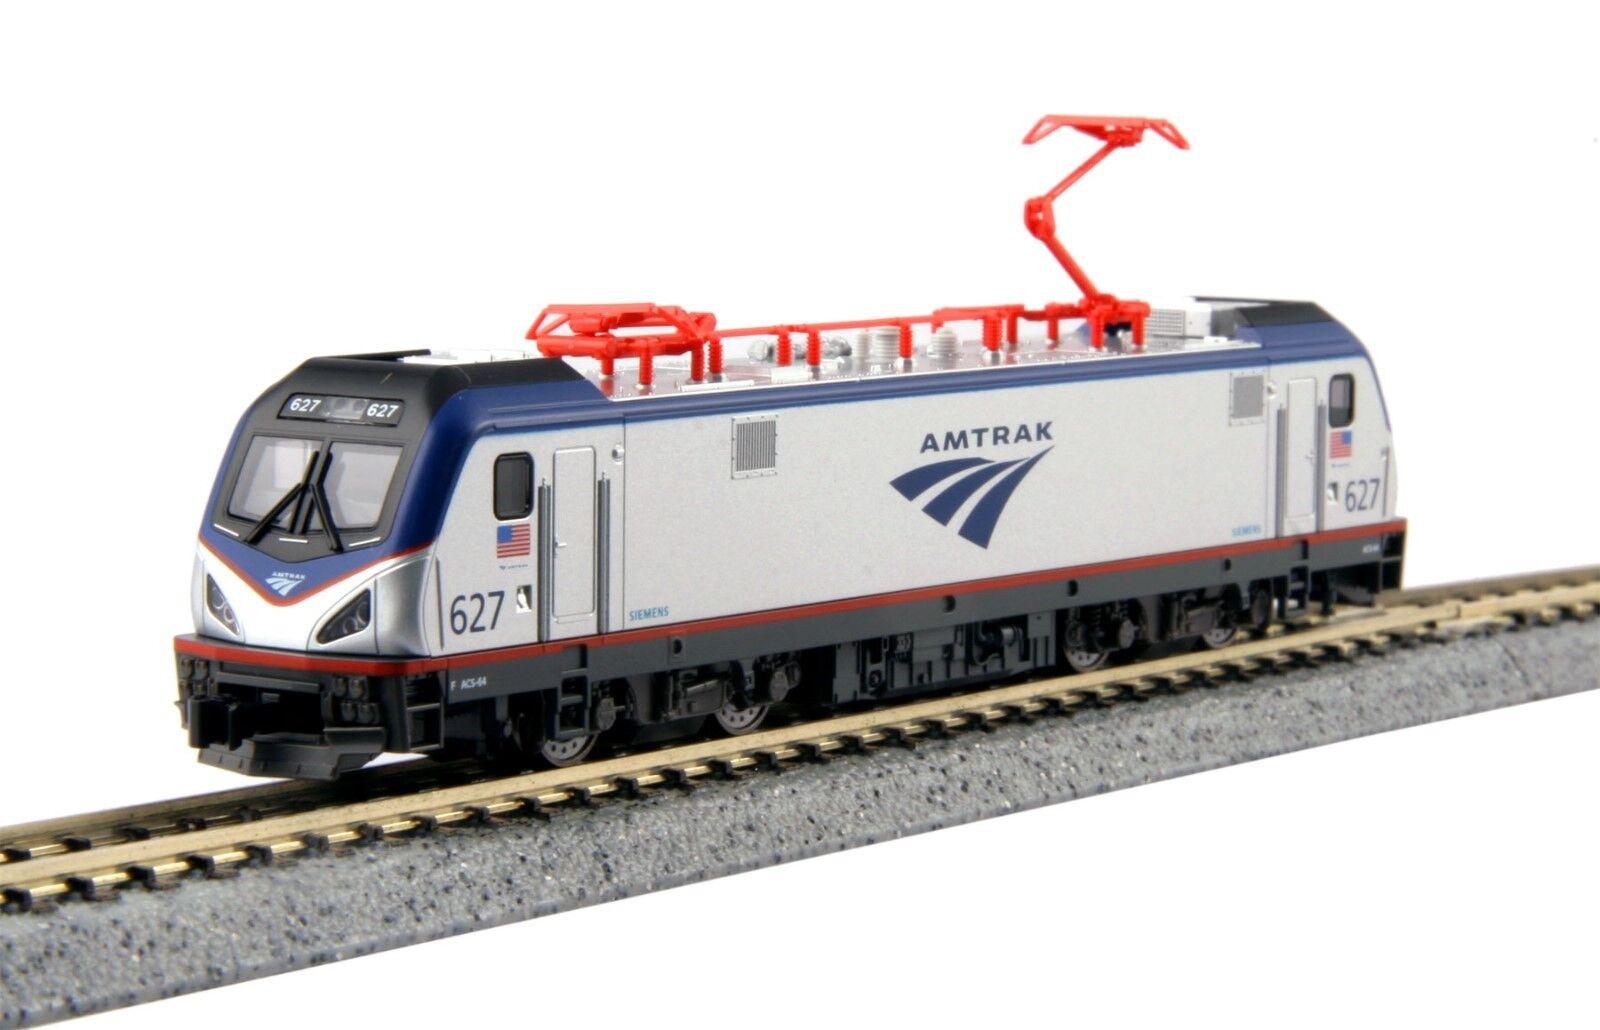 KATO 1373002 N skala ACS -64 Amtrak 627 Electric SIEherr CITY SPRINTER 137 -3002